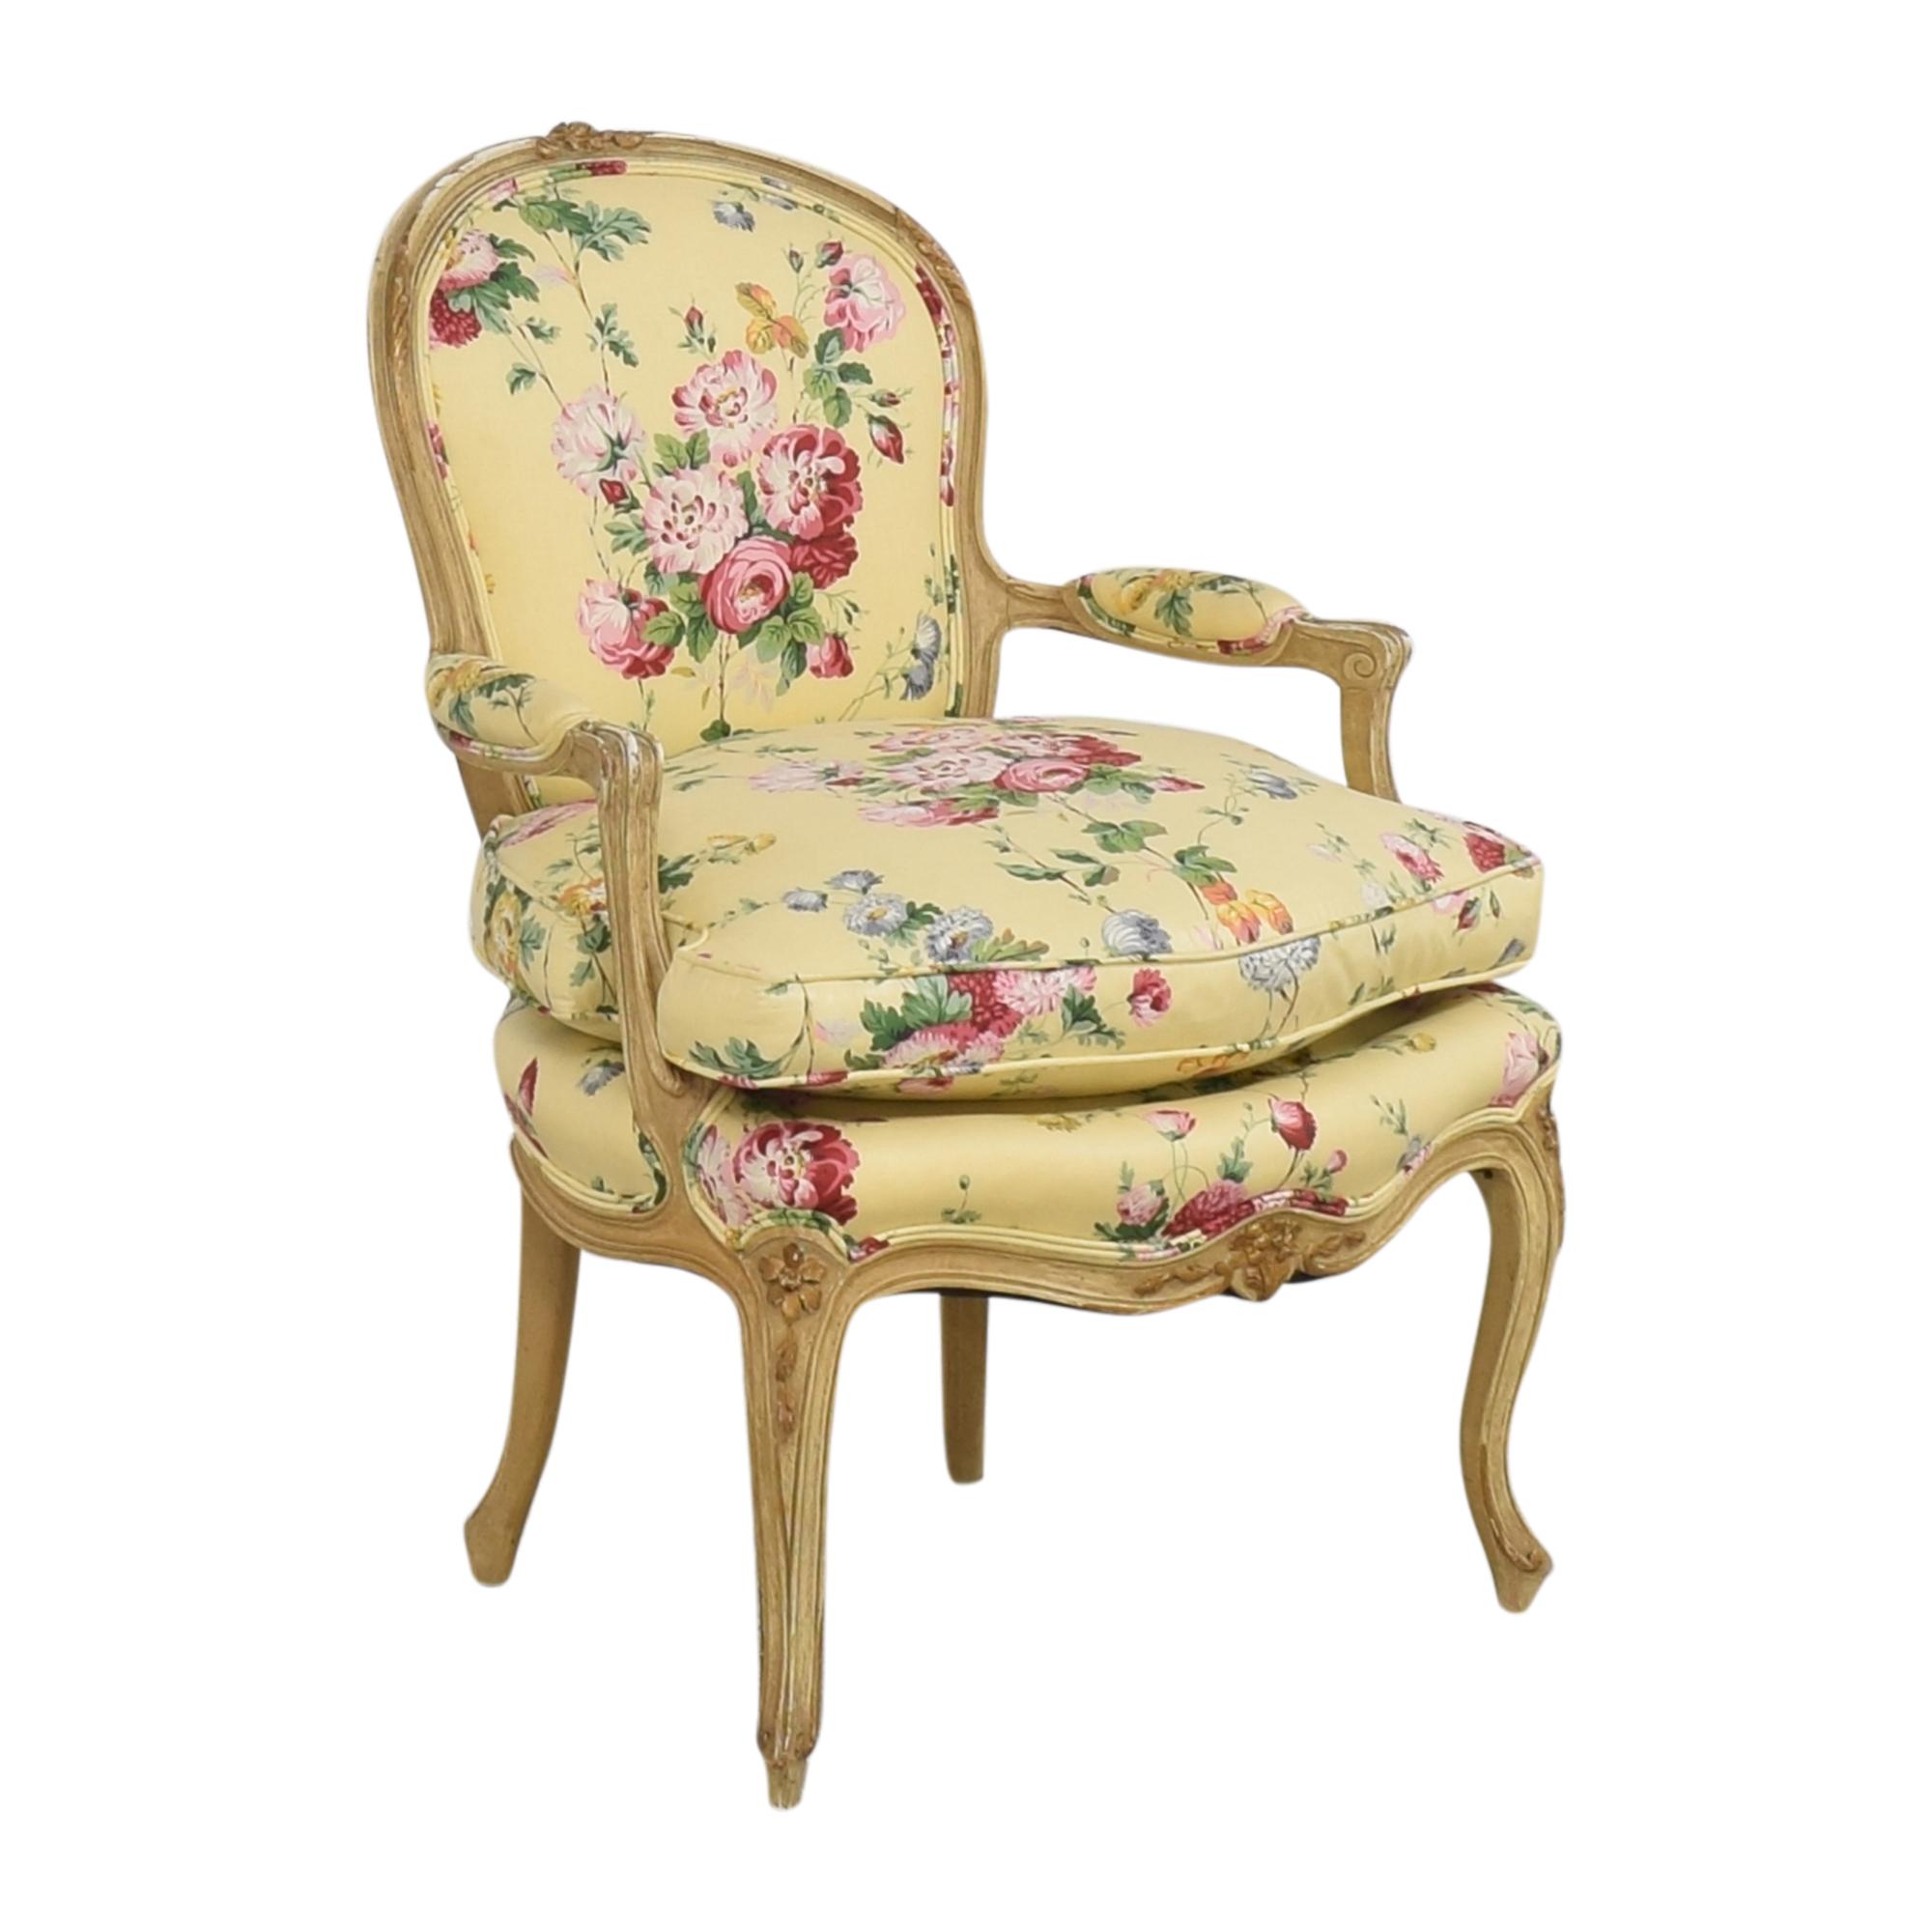 shop Brunschwig & Fils Brunschwig & Fils Custom Floral Chair online